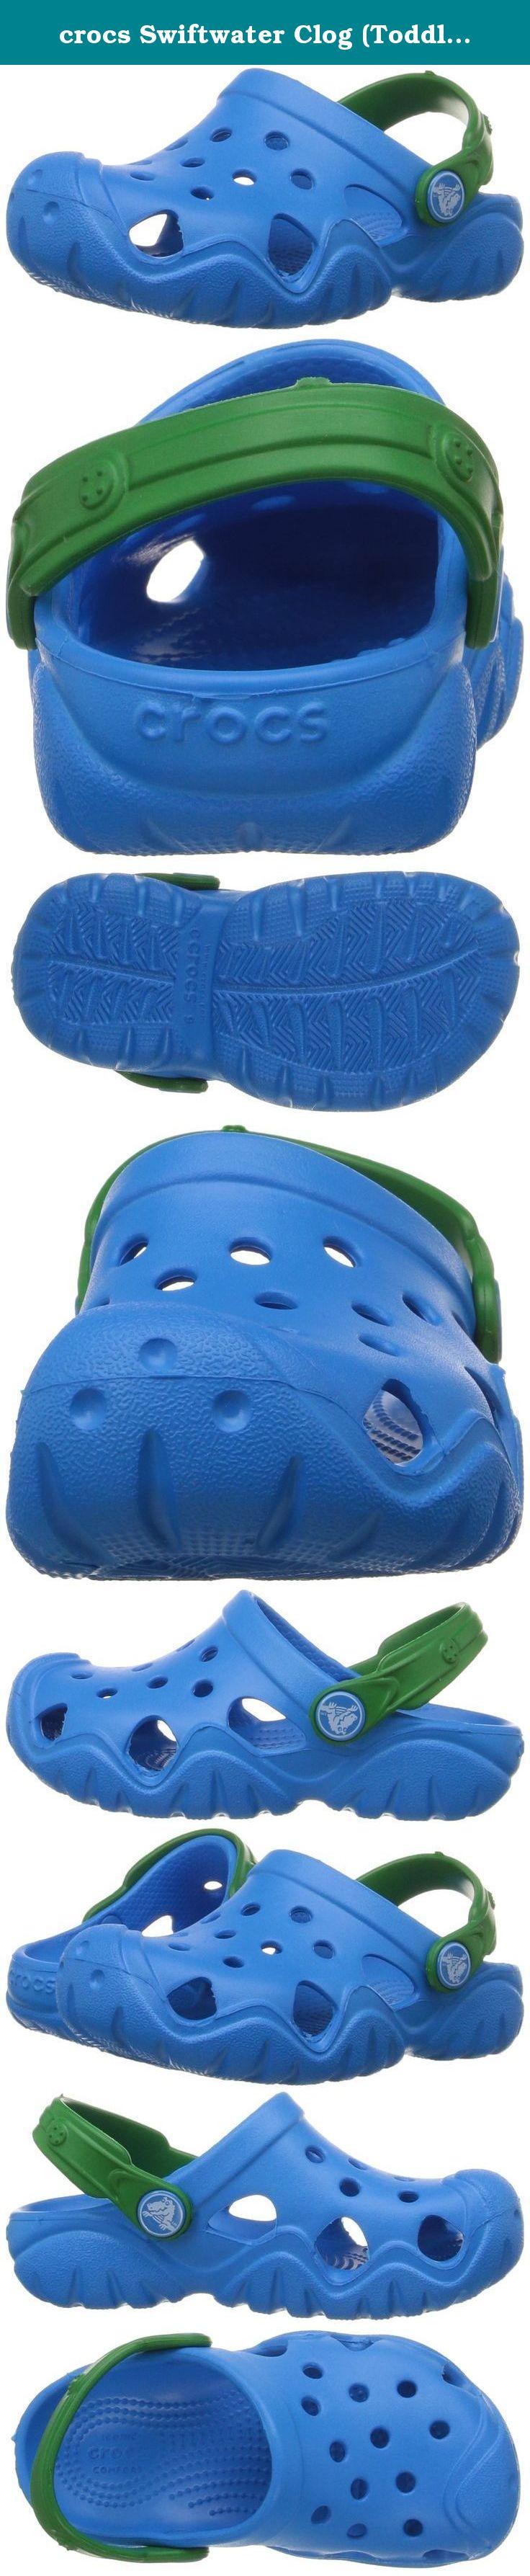 b4f1bd3cb0546 crocs Swiftwater Clog (Toddler Little Kid)